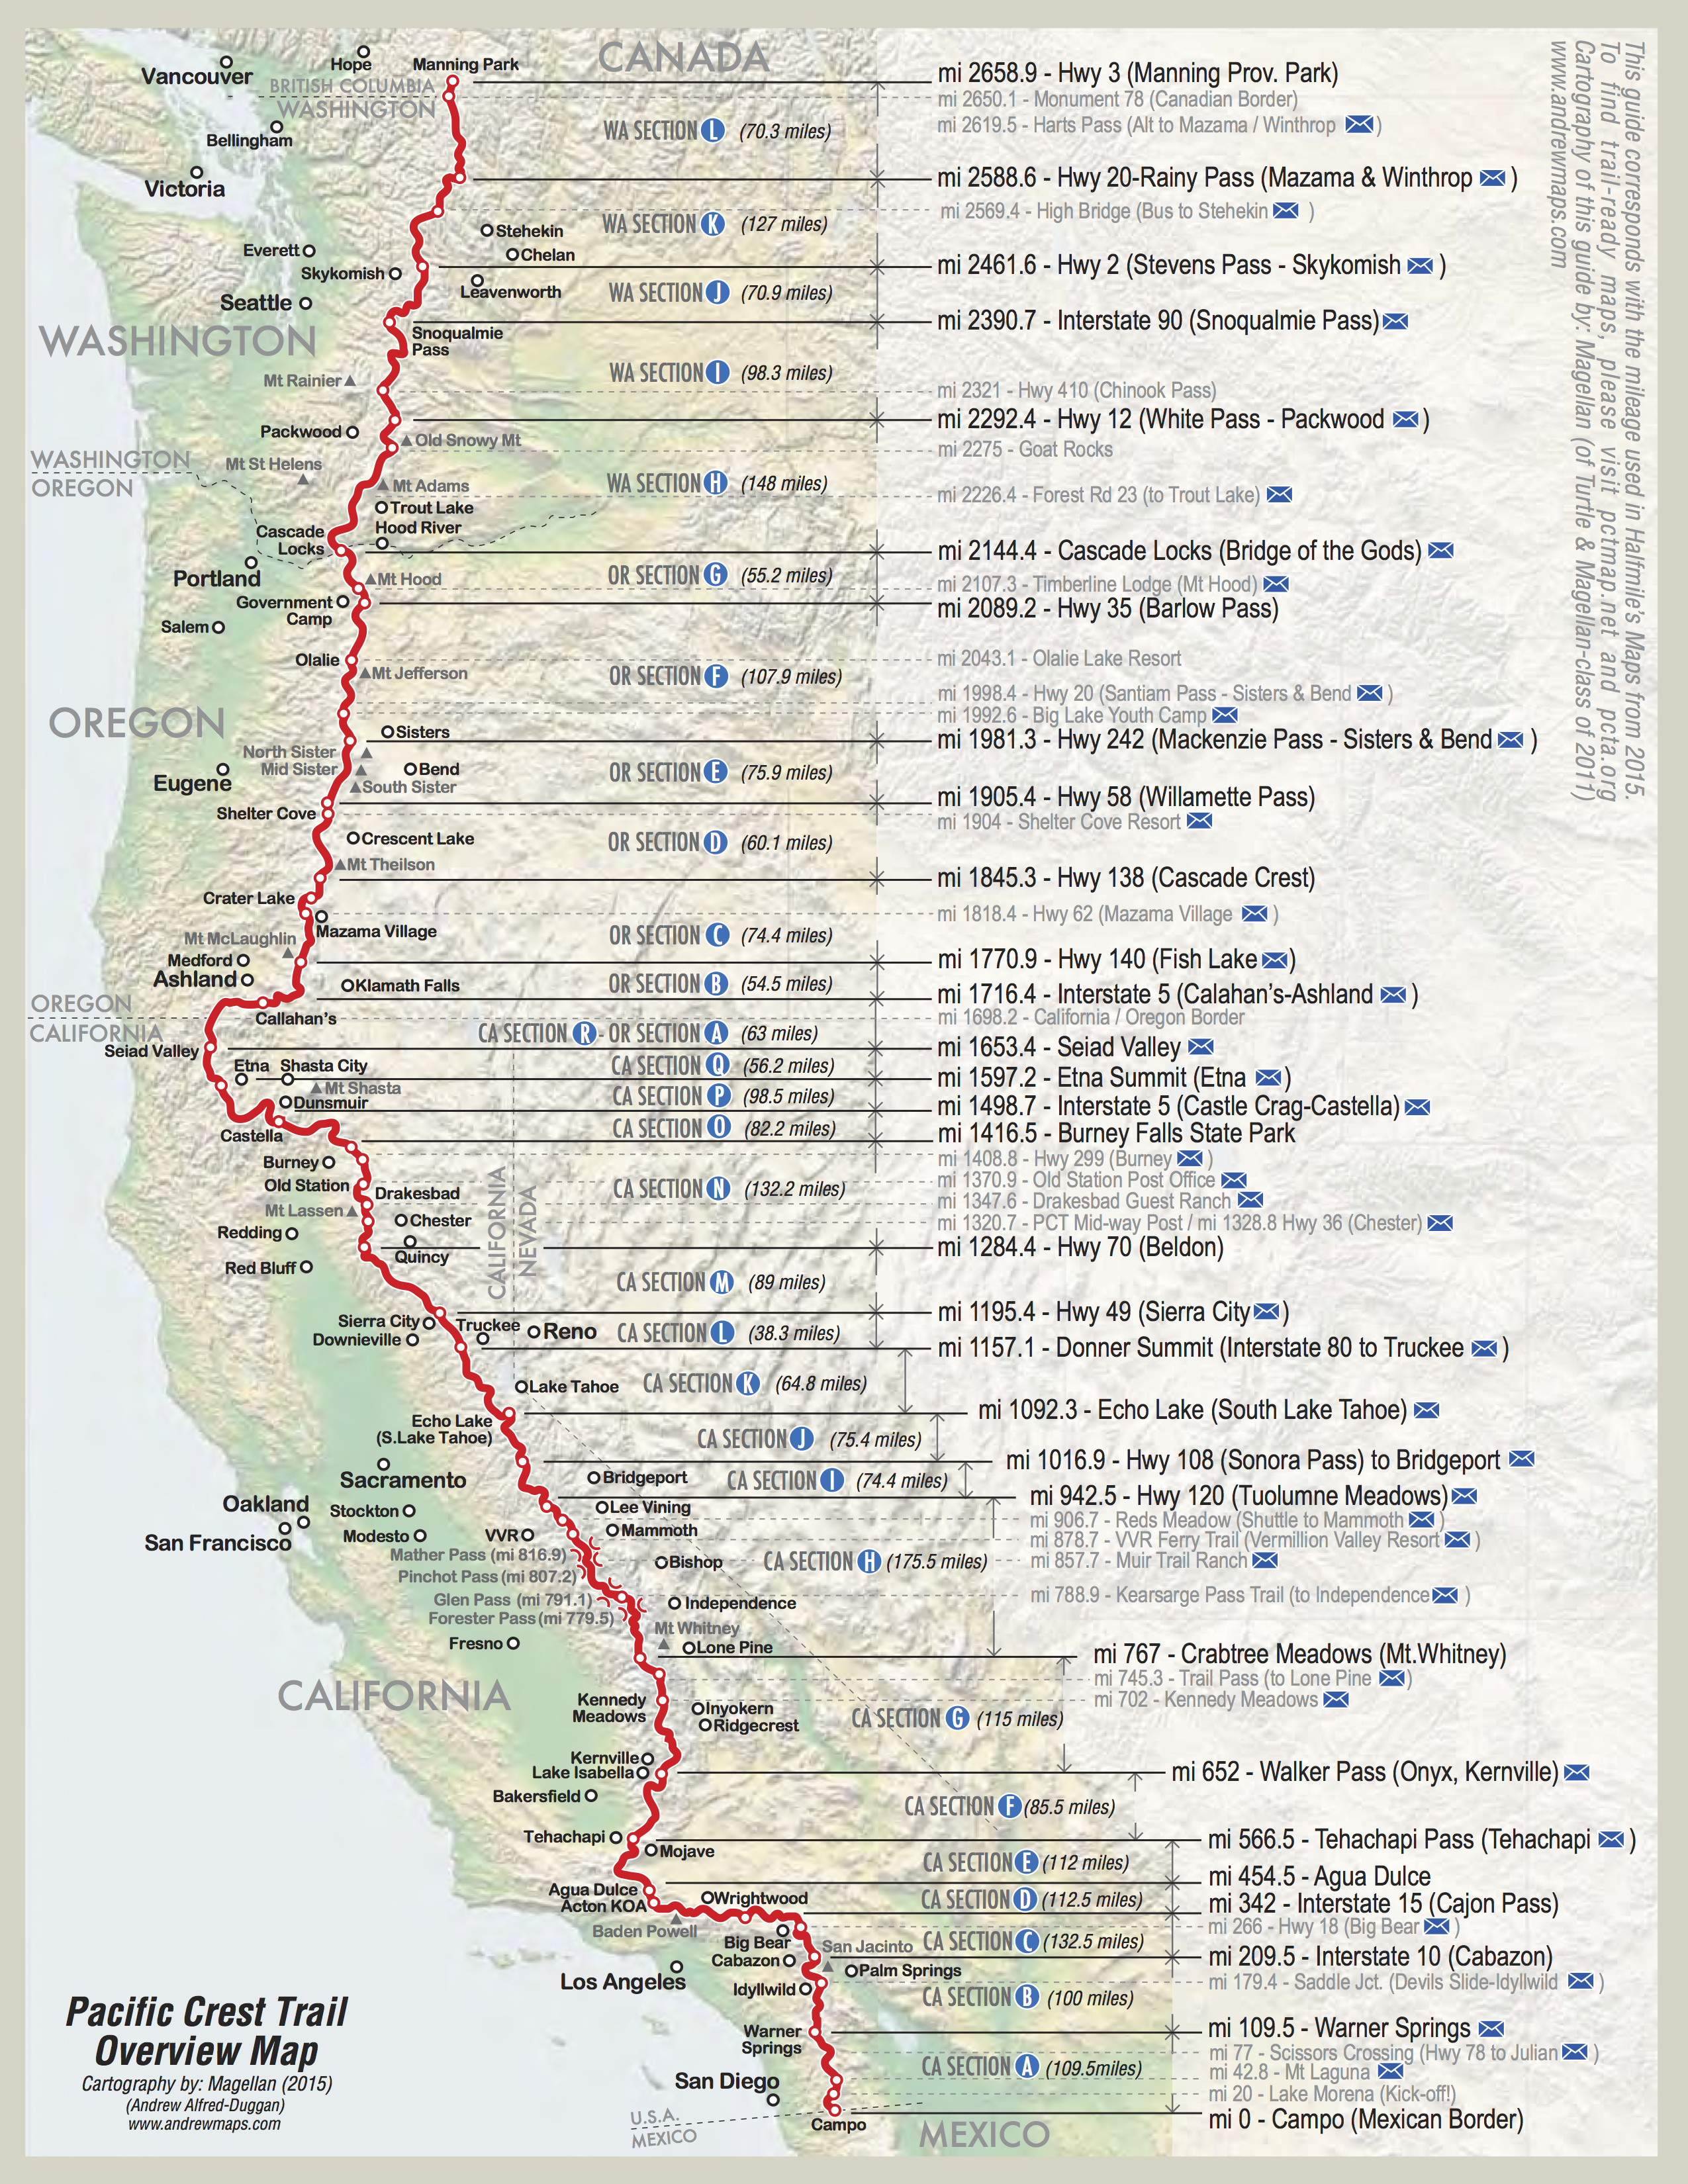 Canada California Map.Pct Map California California Map Take A Hike Hiking Hiking